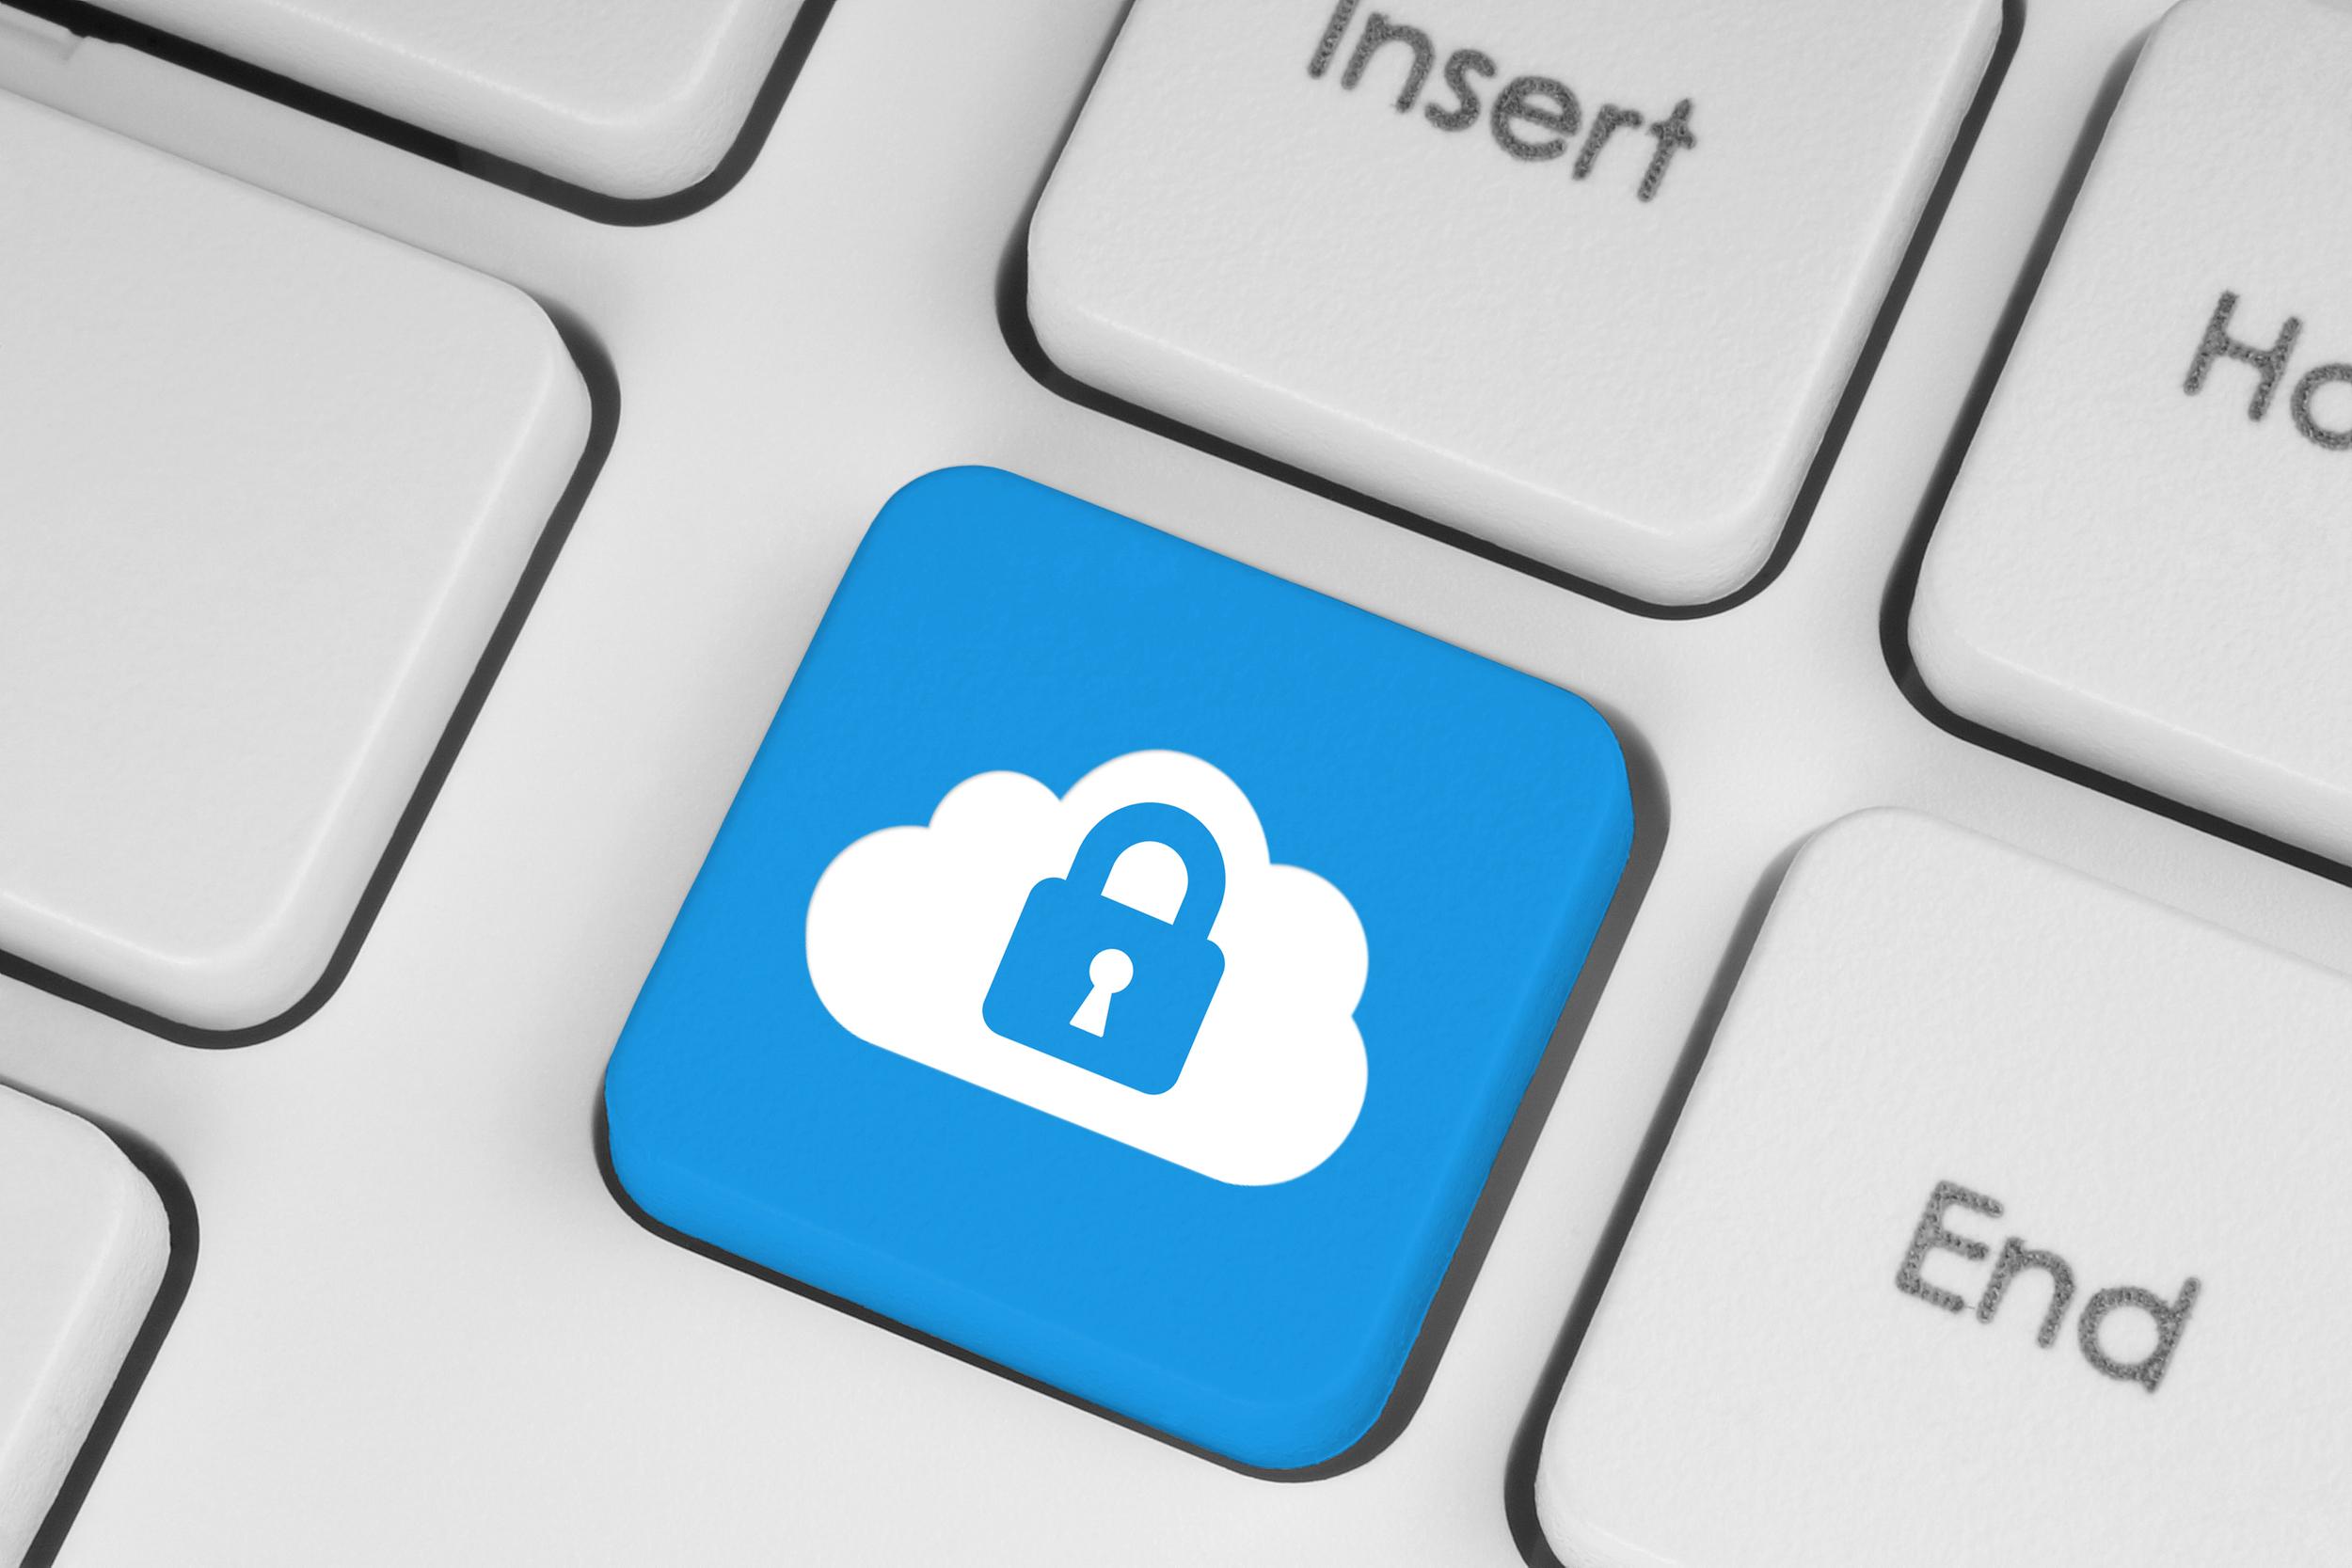 Affinity-technology-partners-nashville-tn-lock-icon-blue